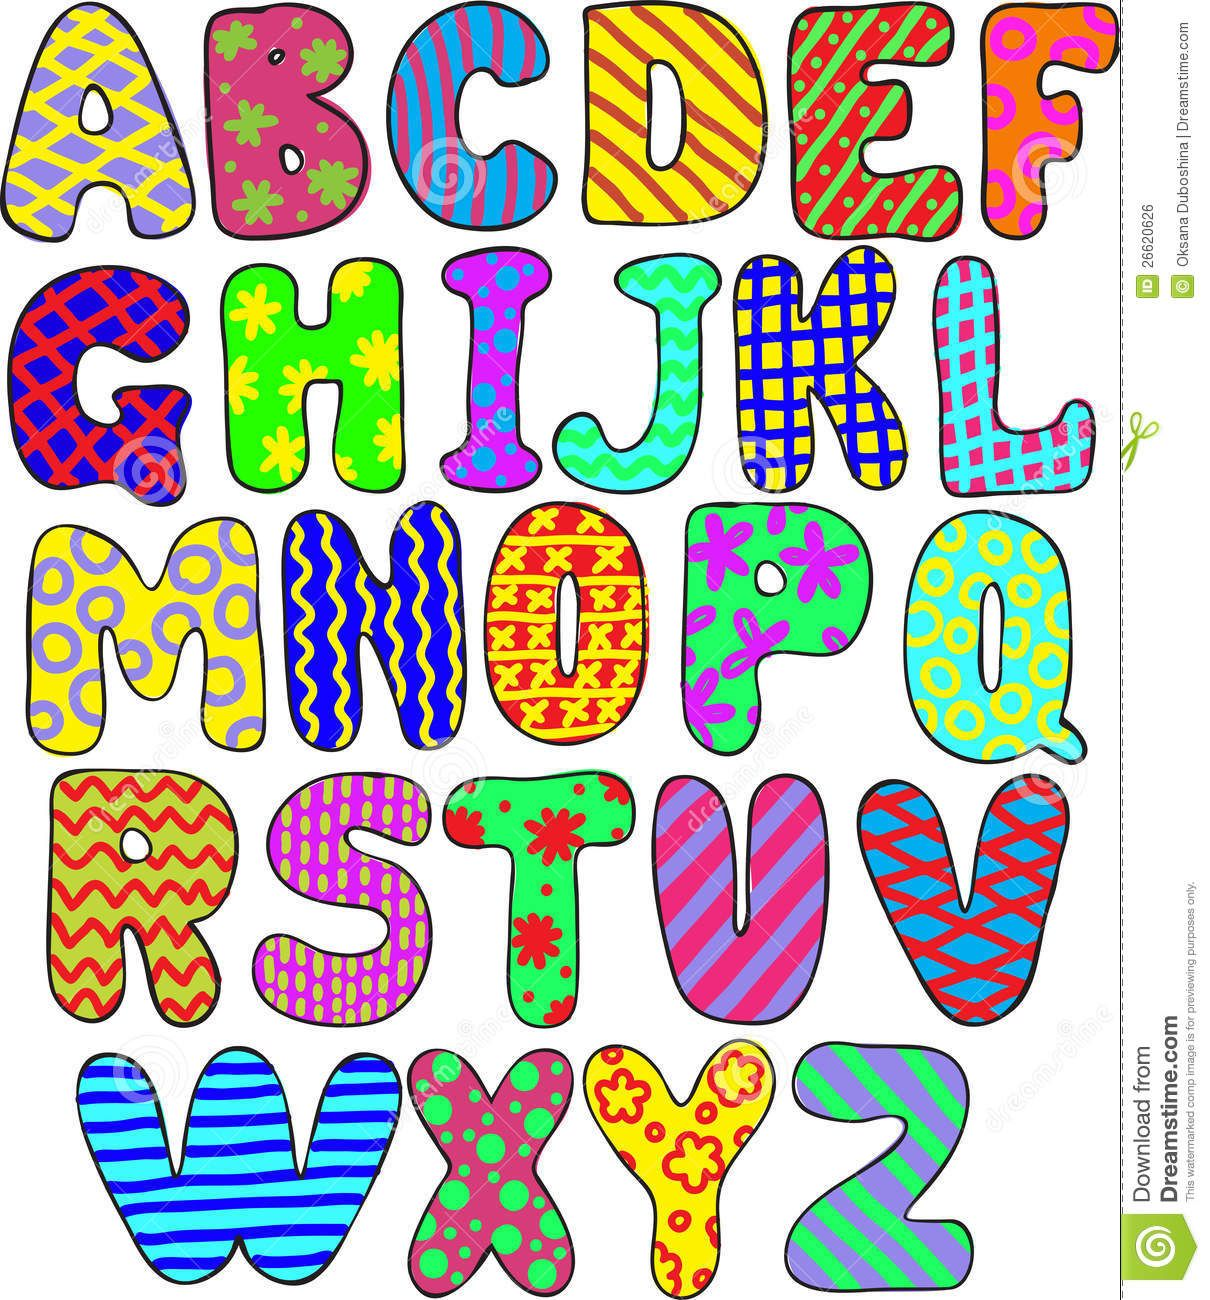 eps Instant download uppercase letters jpeg scrapbooking Patterned Alphabet Clip Art Set-A-Z png colorful letters